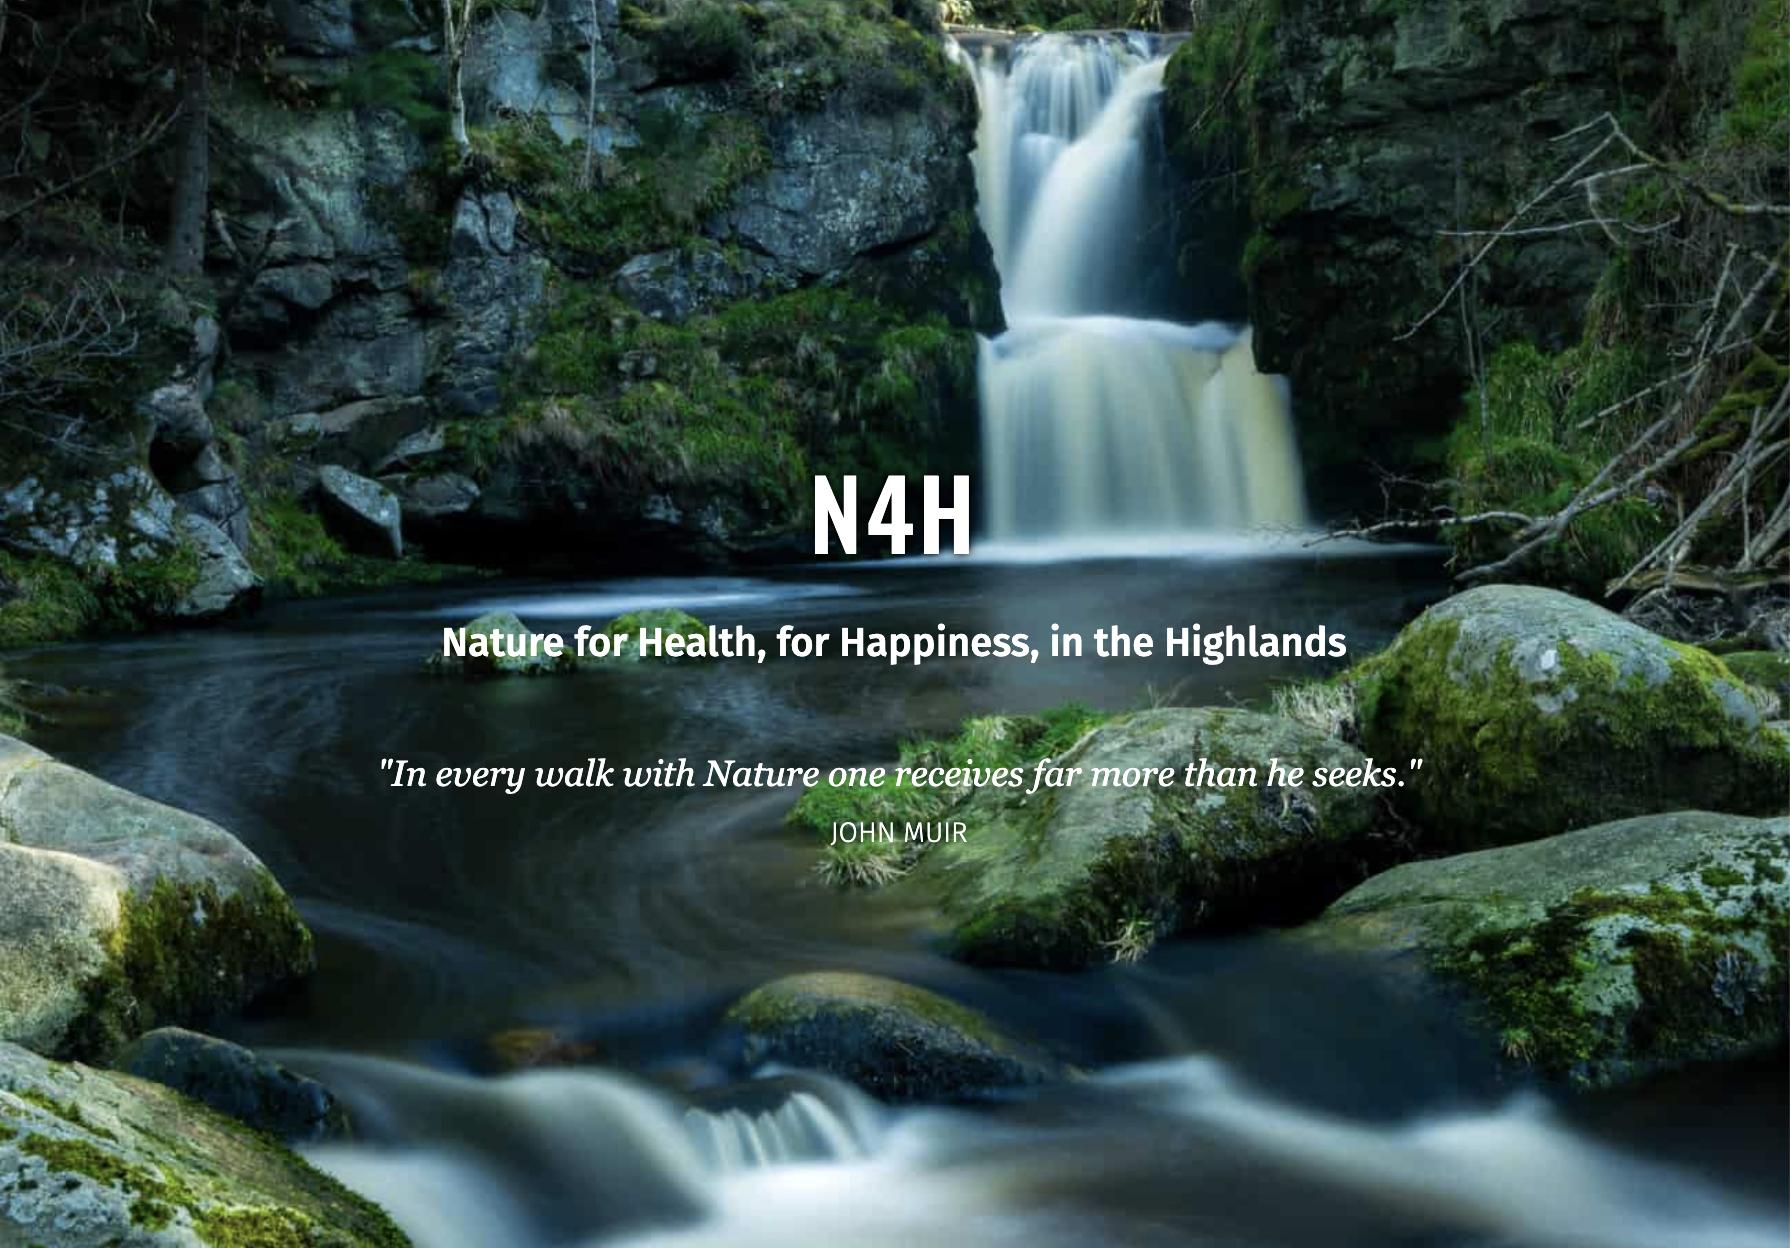 Nature 4 Health